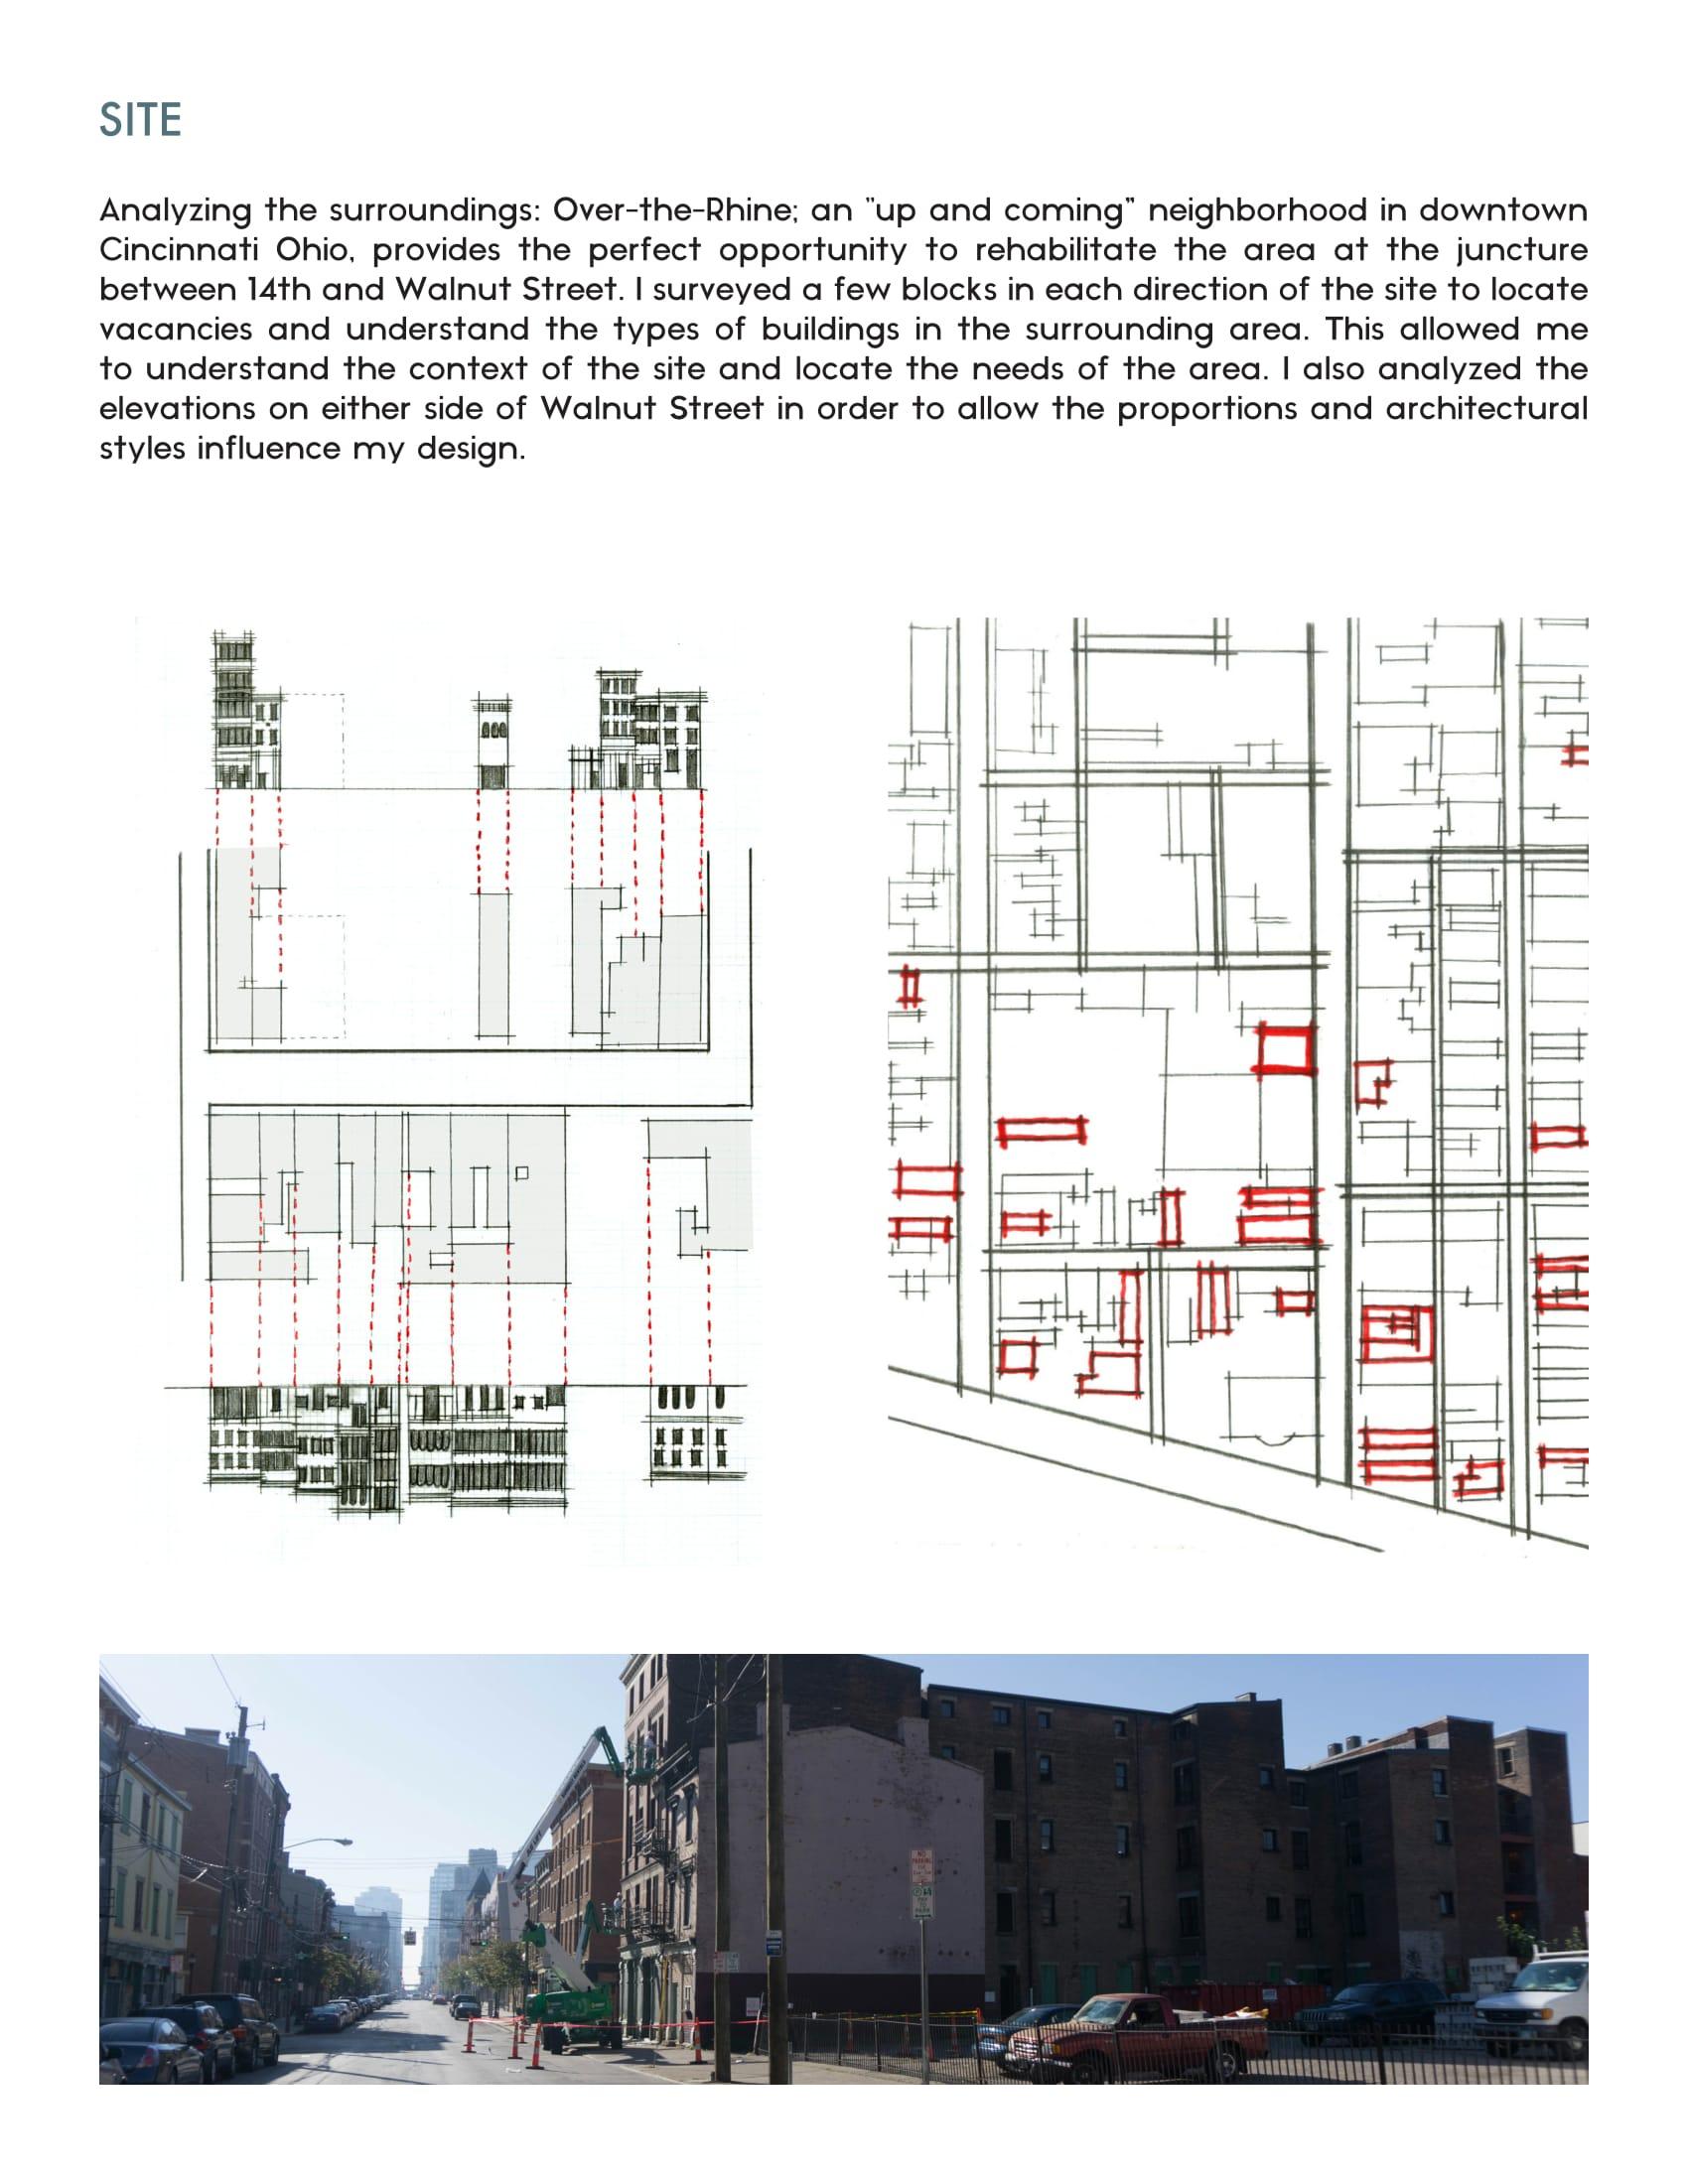 Wanut Street File -04.jpg